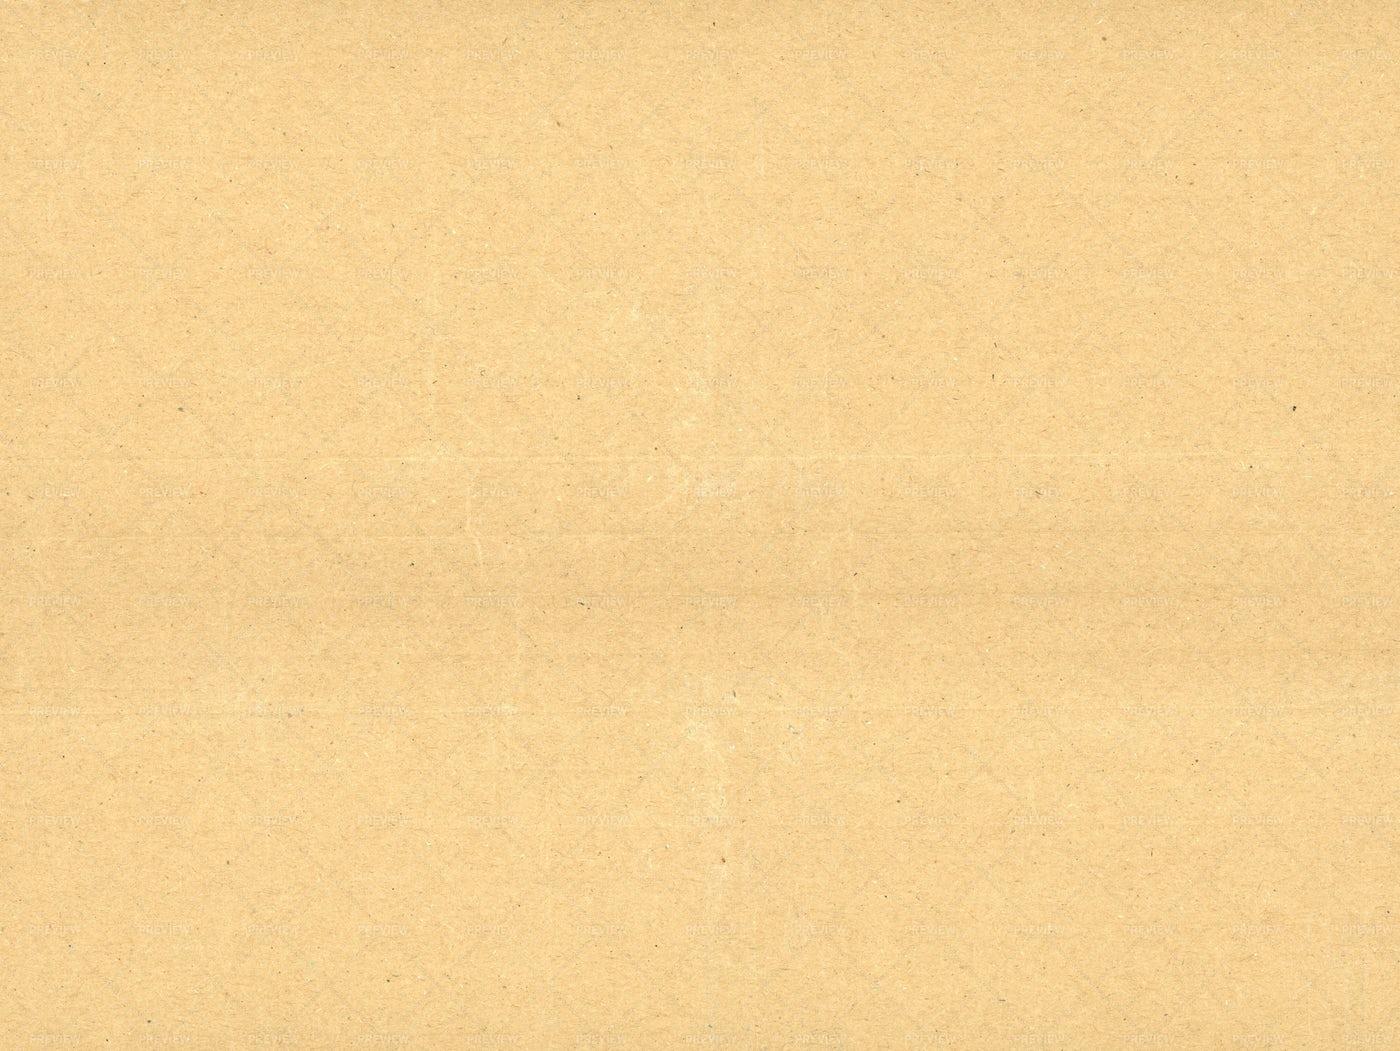 Corrugated Brown Cardboard: Stock Photos